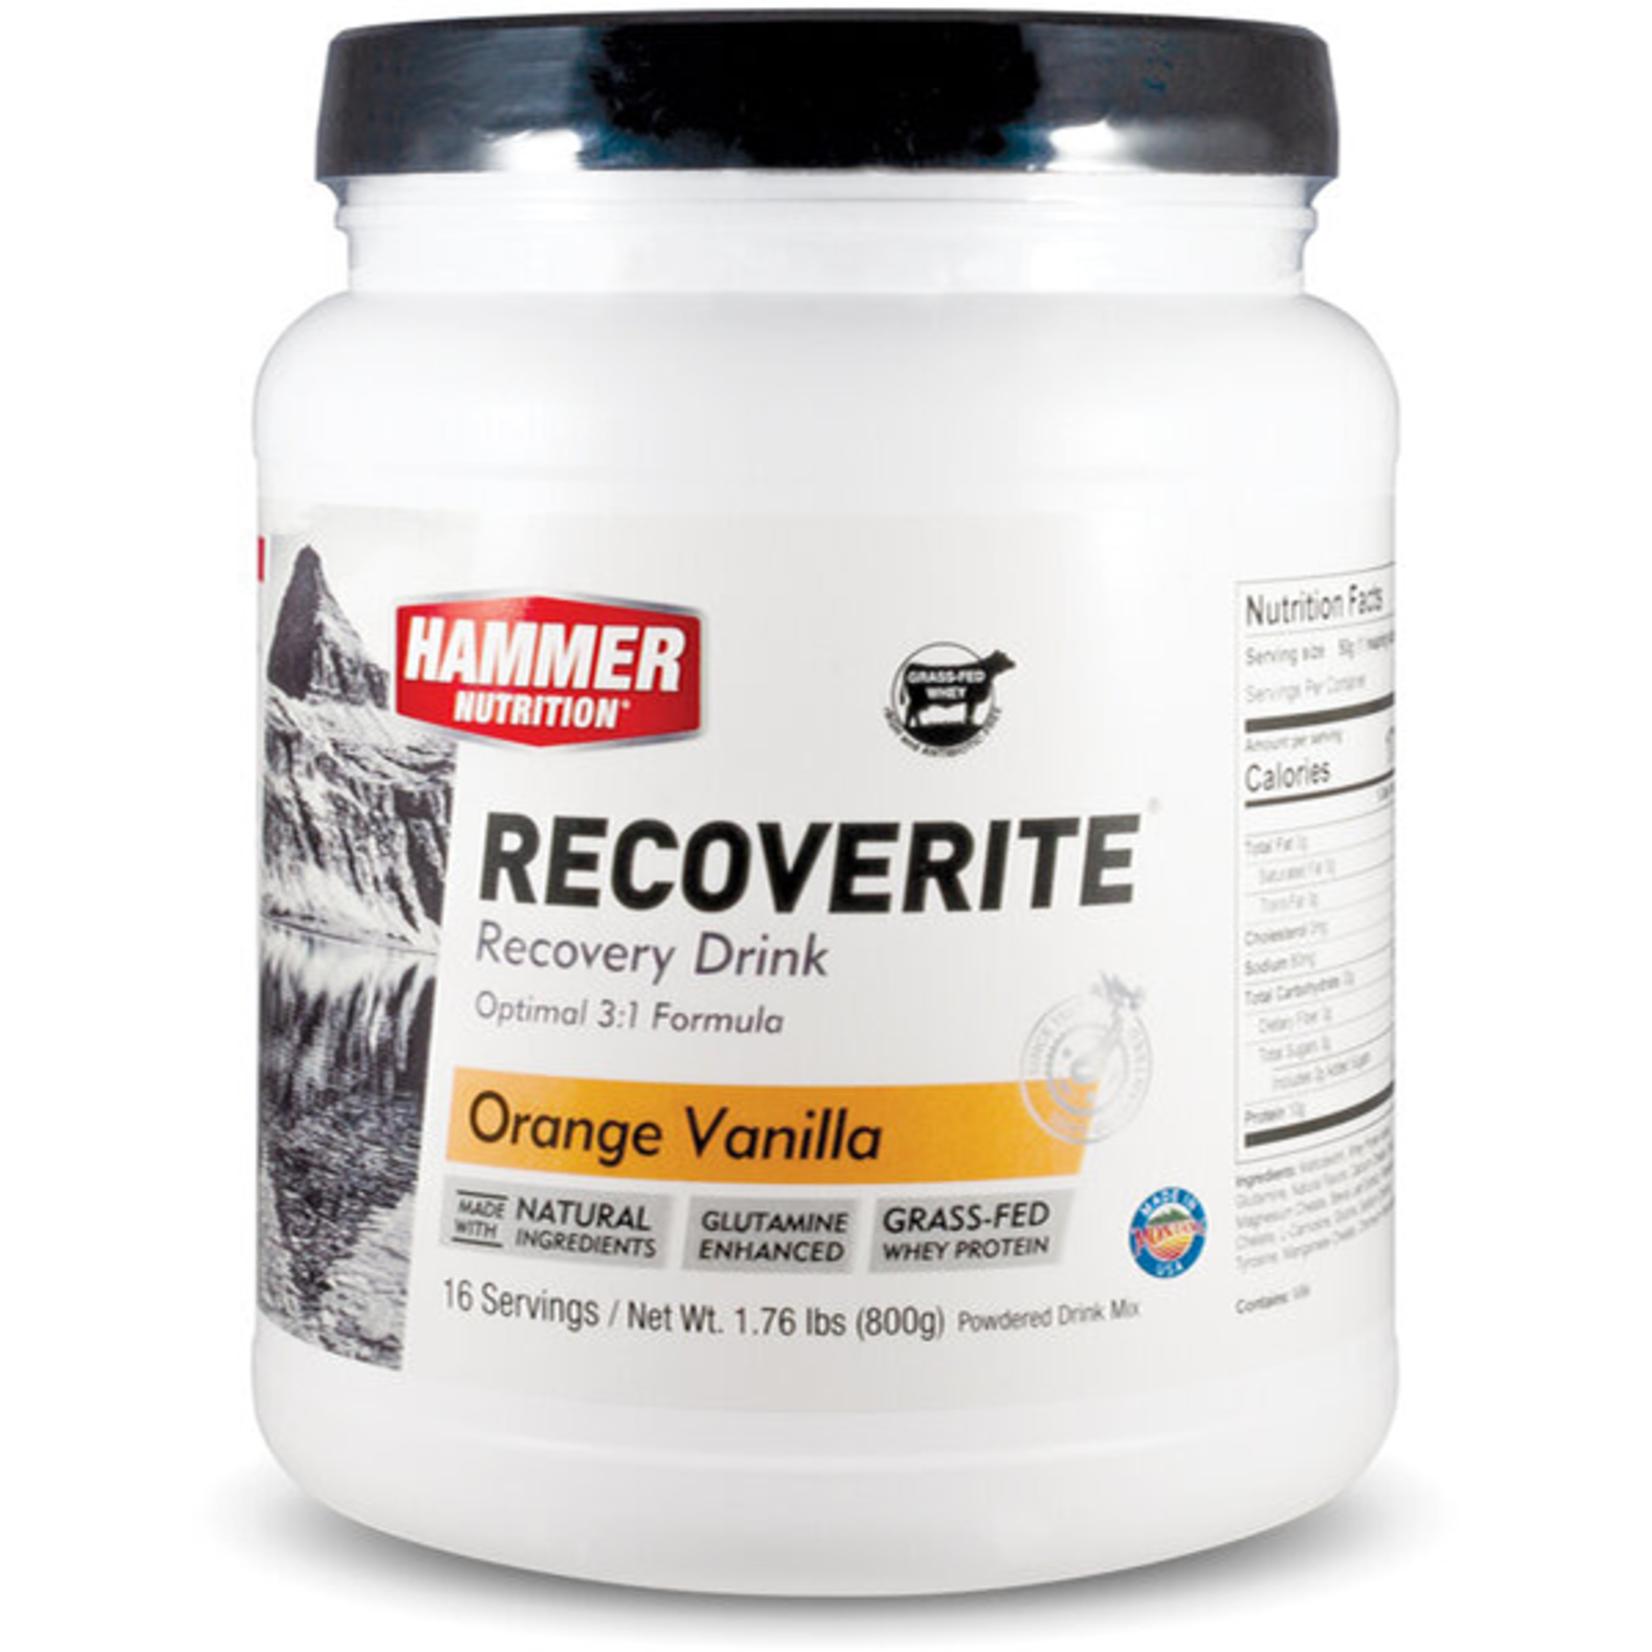 Hammer Nutrition Recoverite